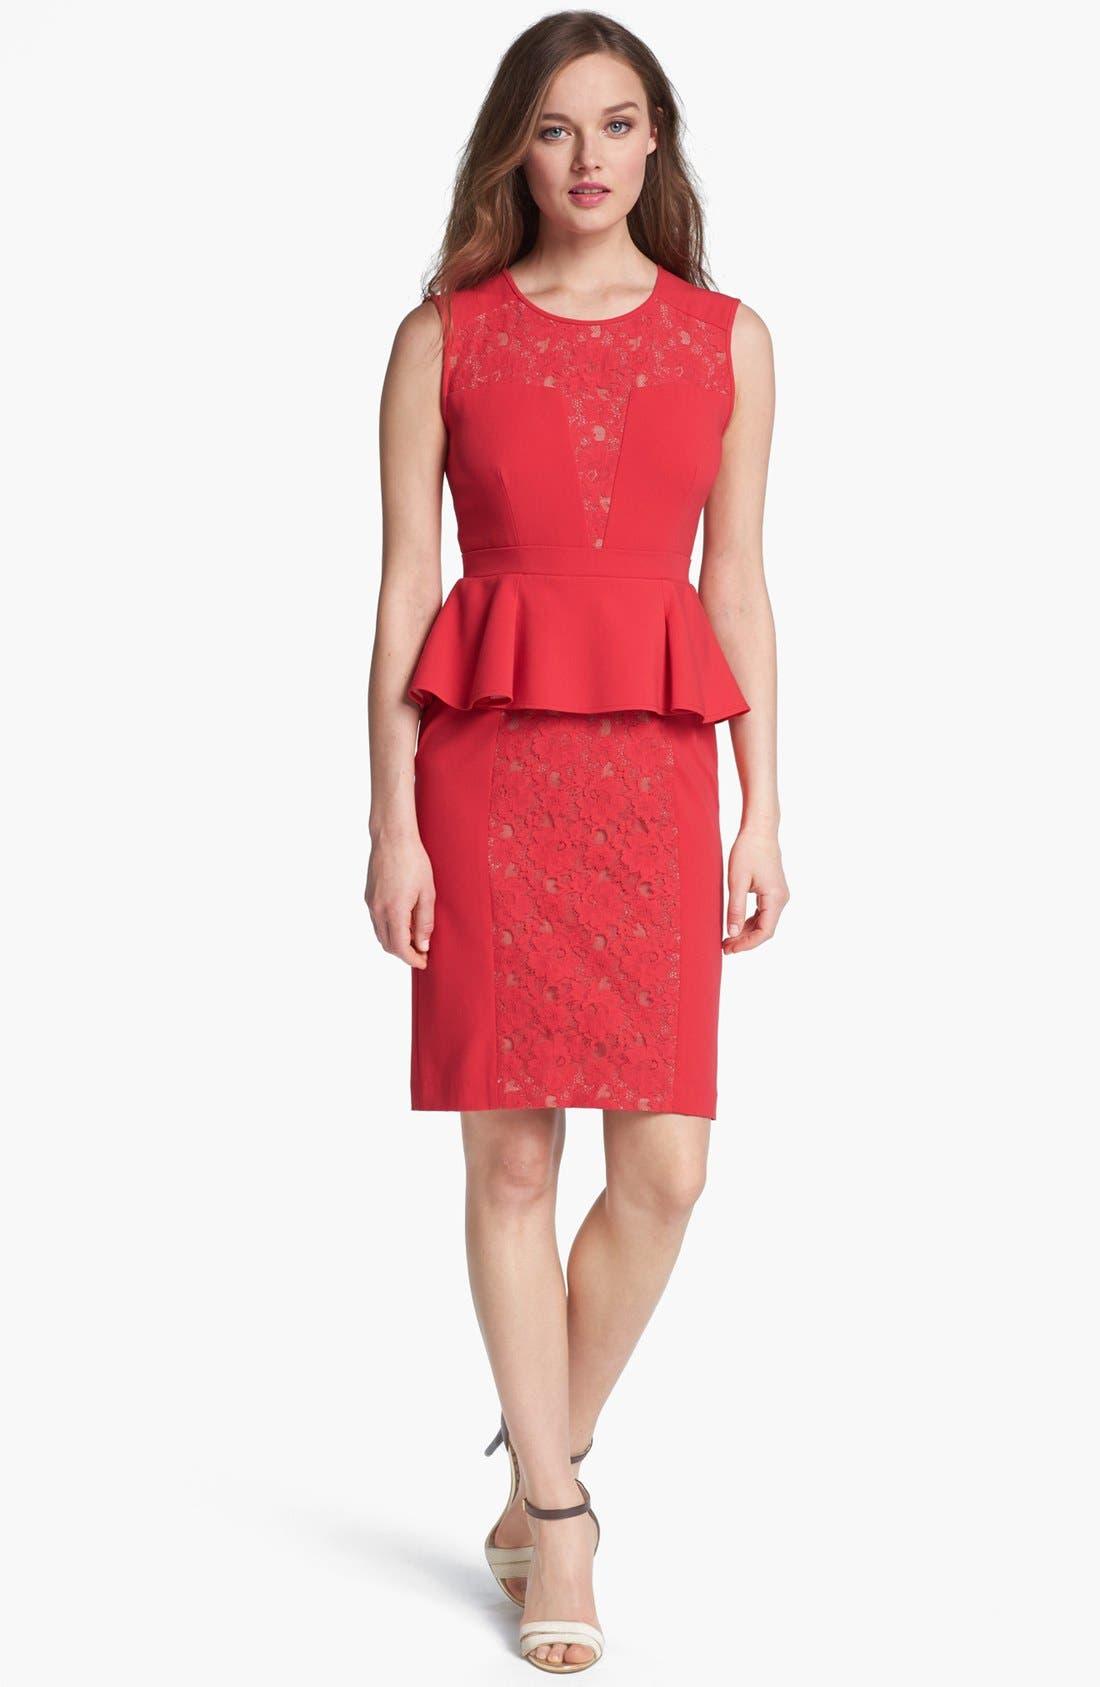 Main Image - BCBGMAXAZRIA Lace Inset Peplum Sheath Dress